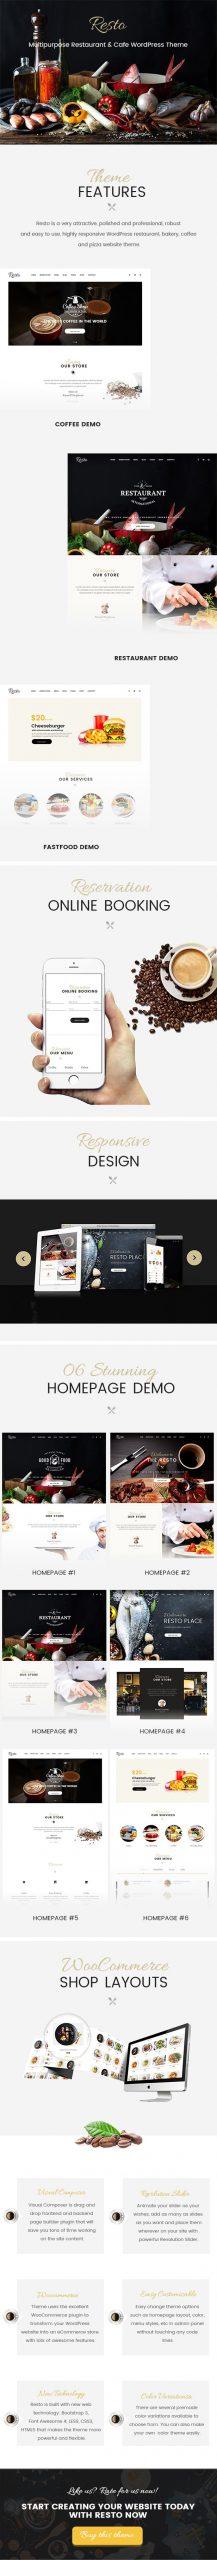 Resto - Multipurpose Restaurant & Cafe WordPress Theme